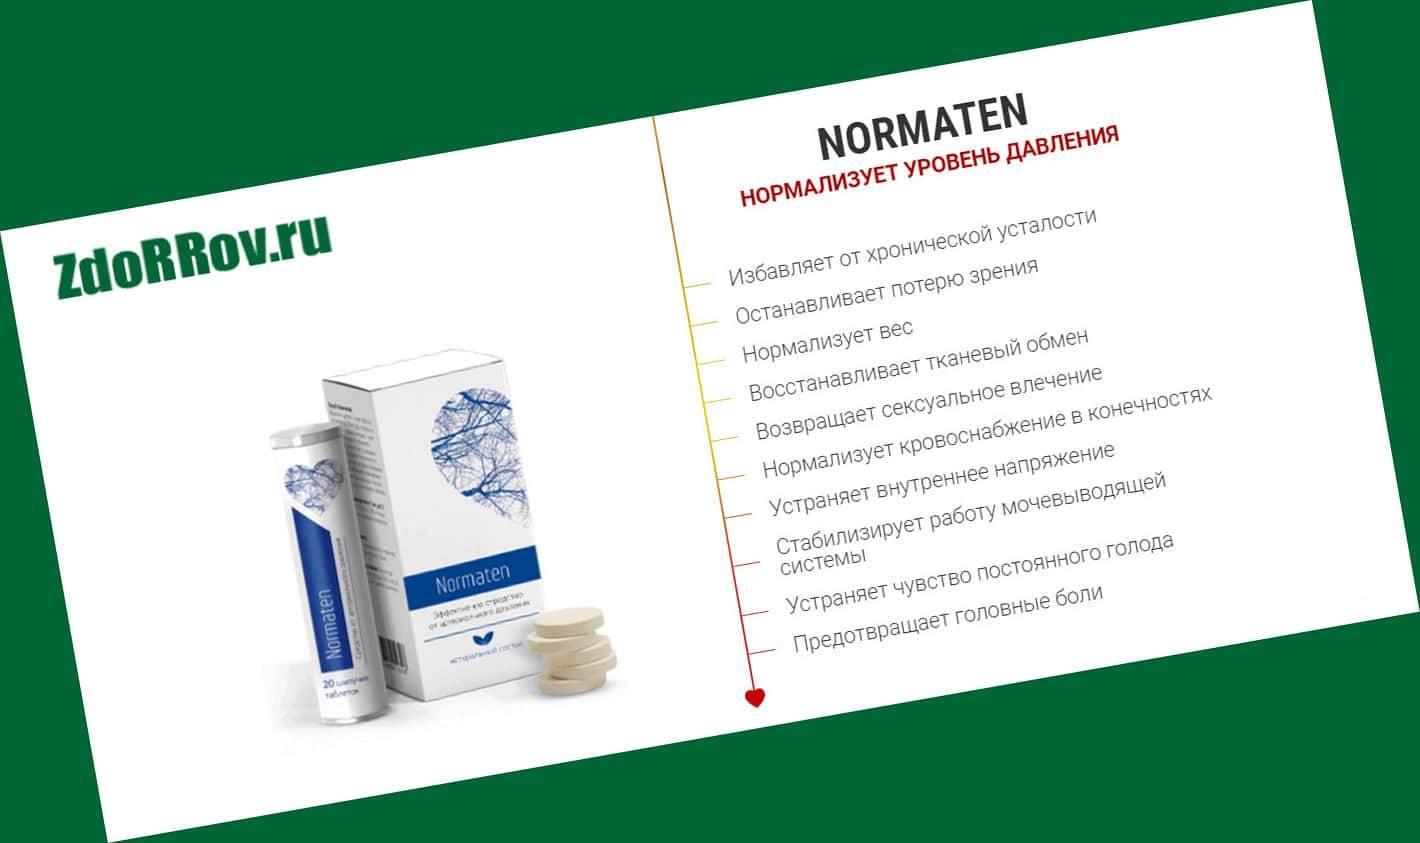 Действие препарата Normaten